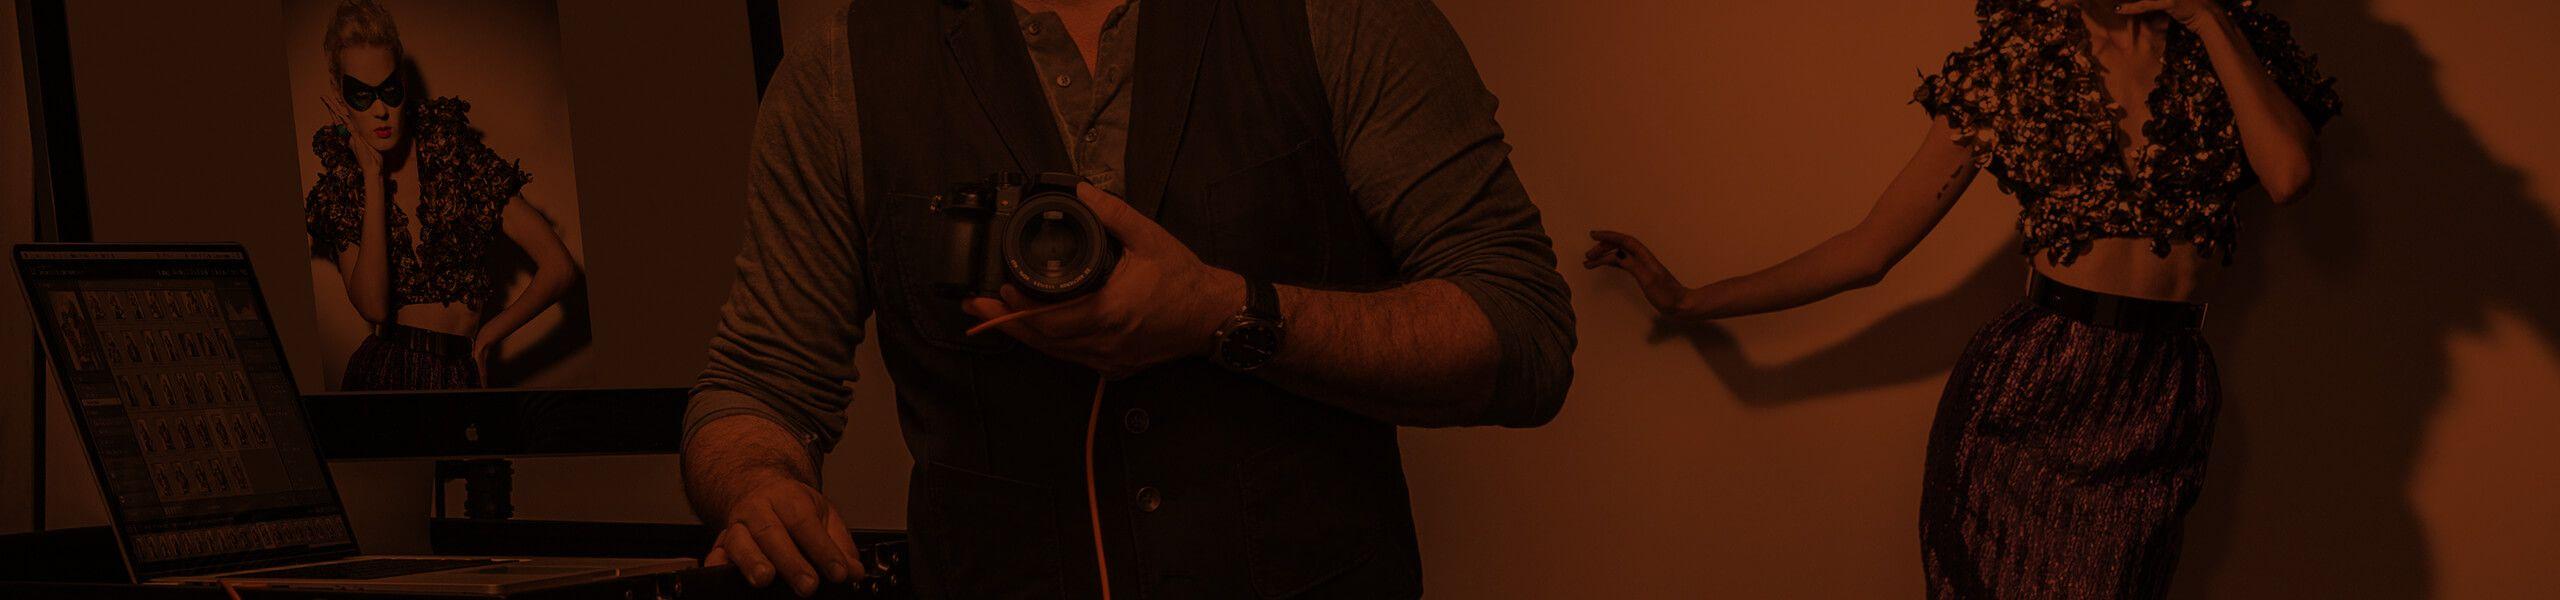 Blog_Portrait.jpg